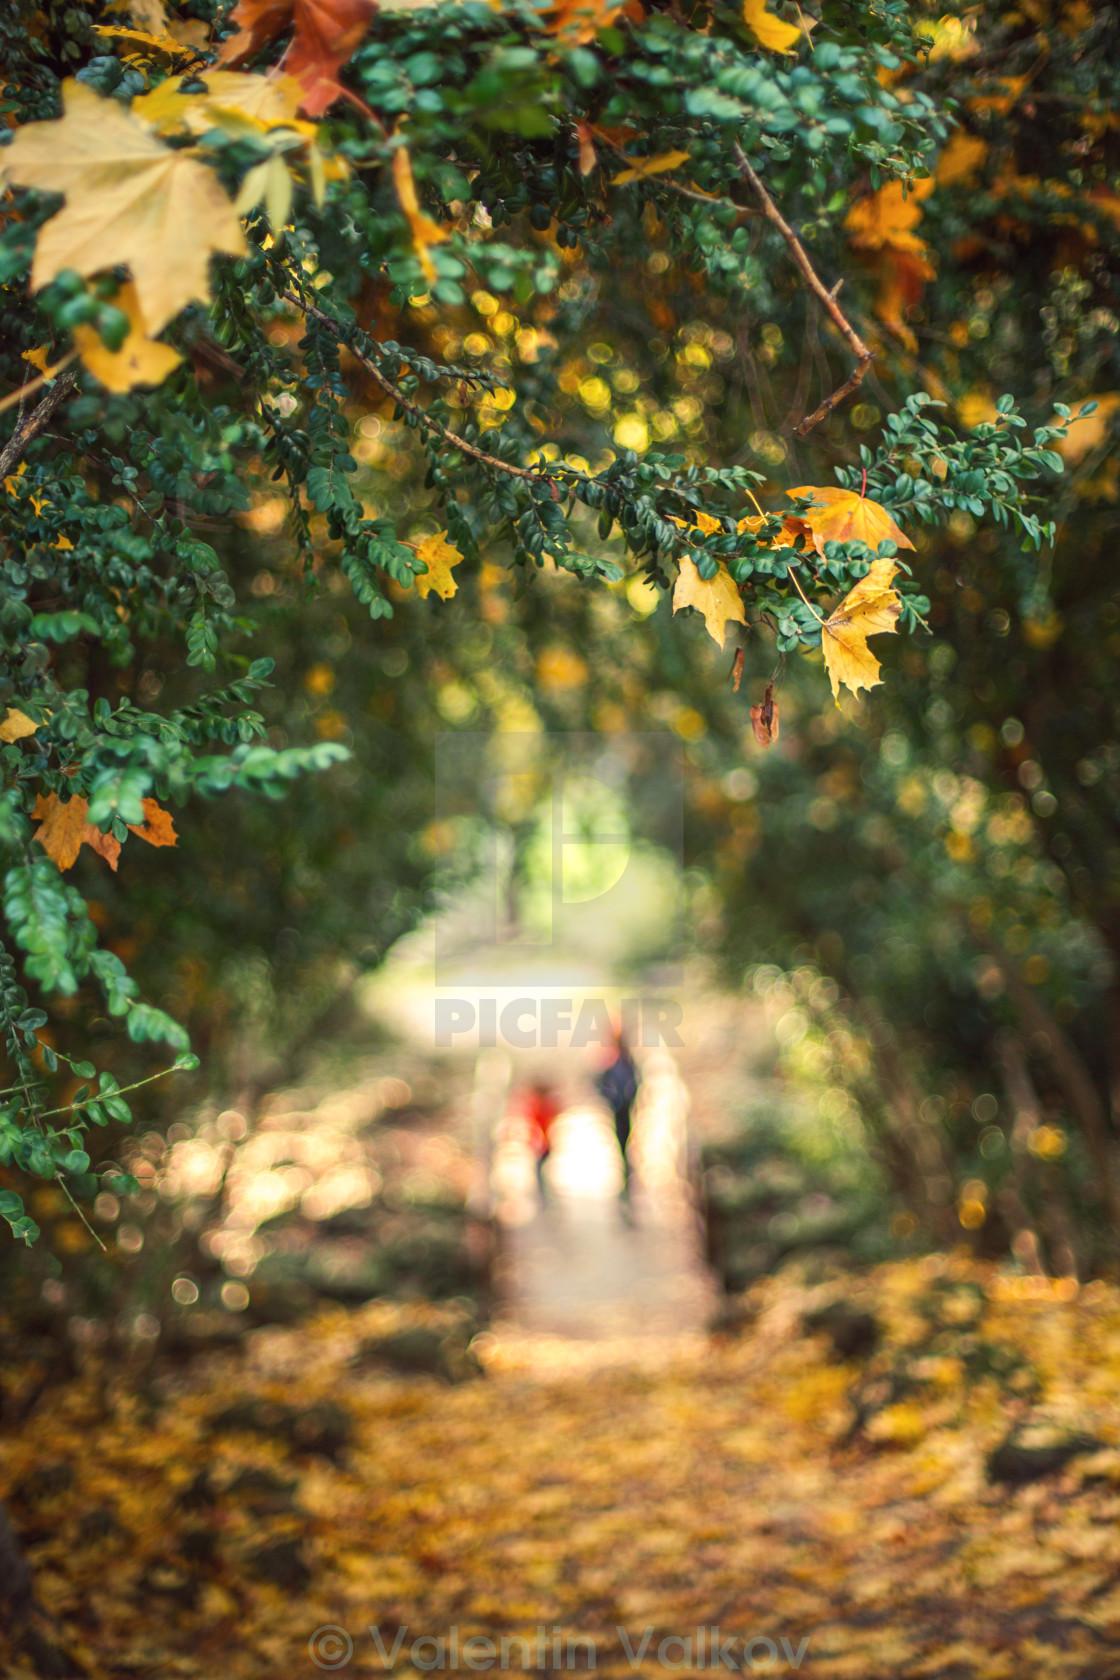 """Autumn leaf and defocused background"" stock image"